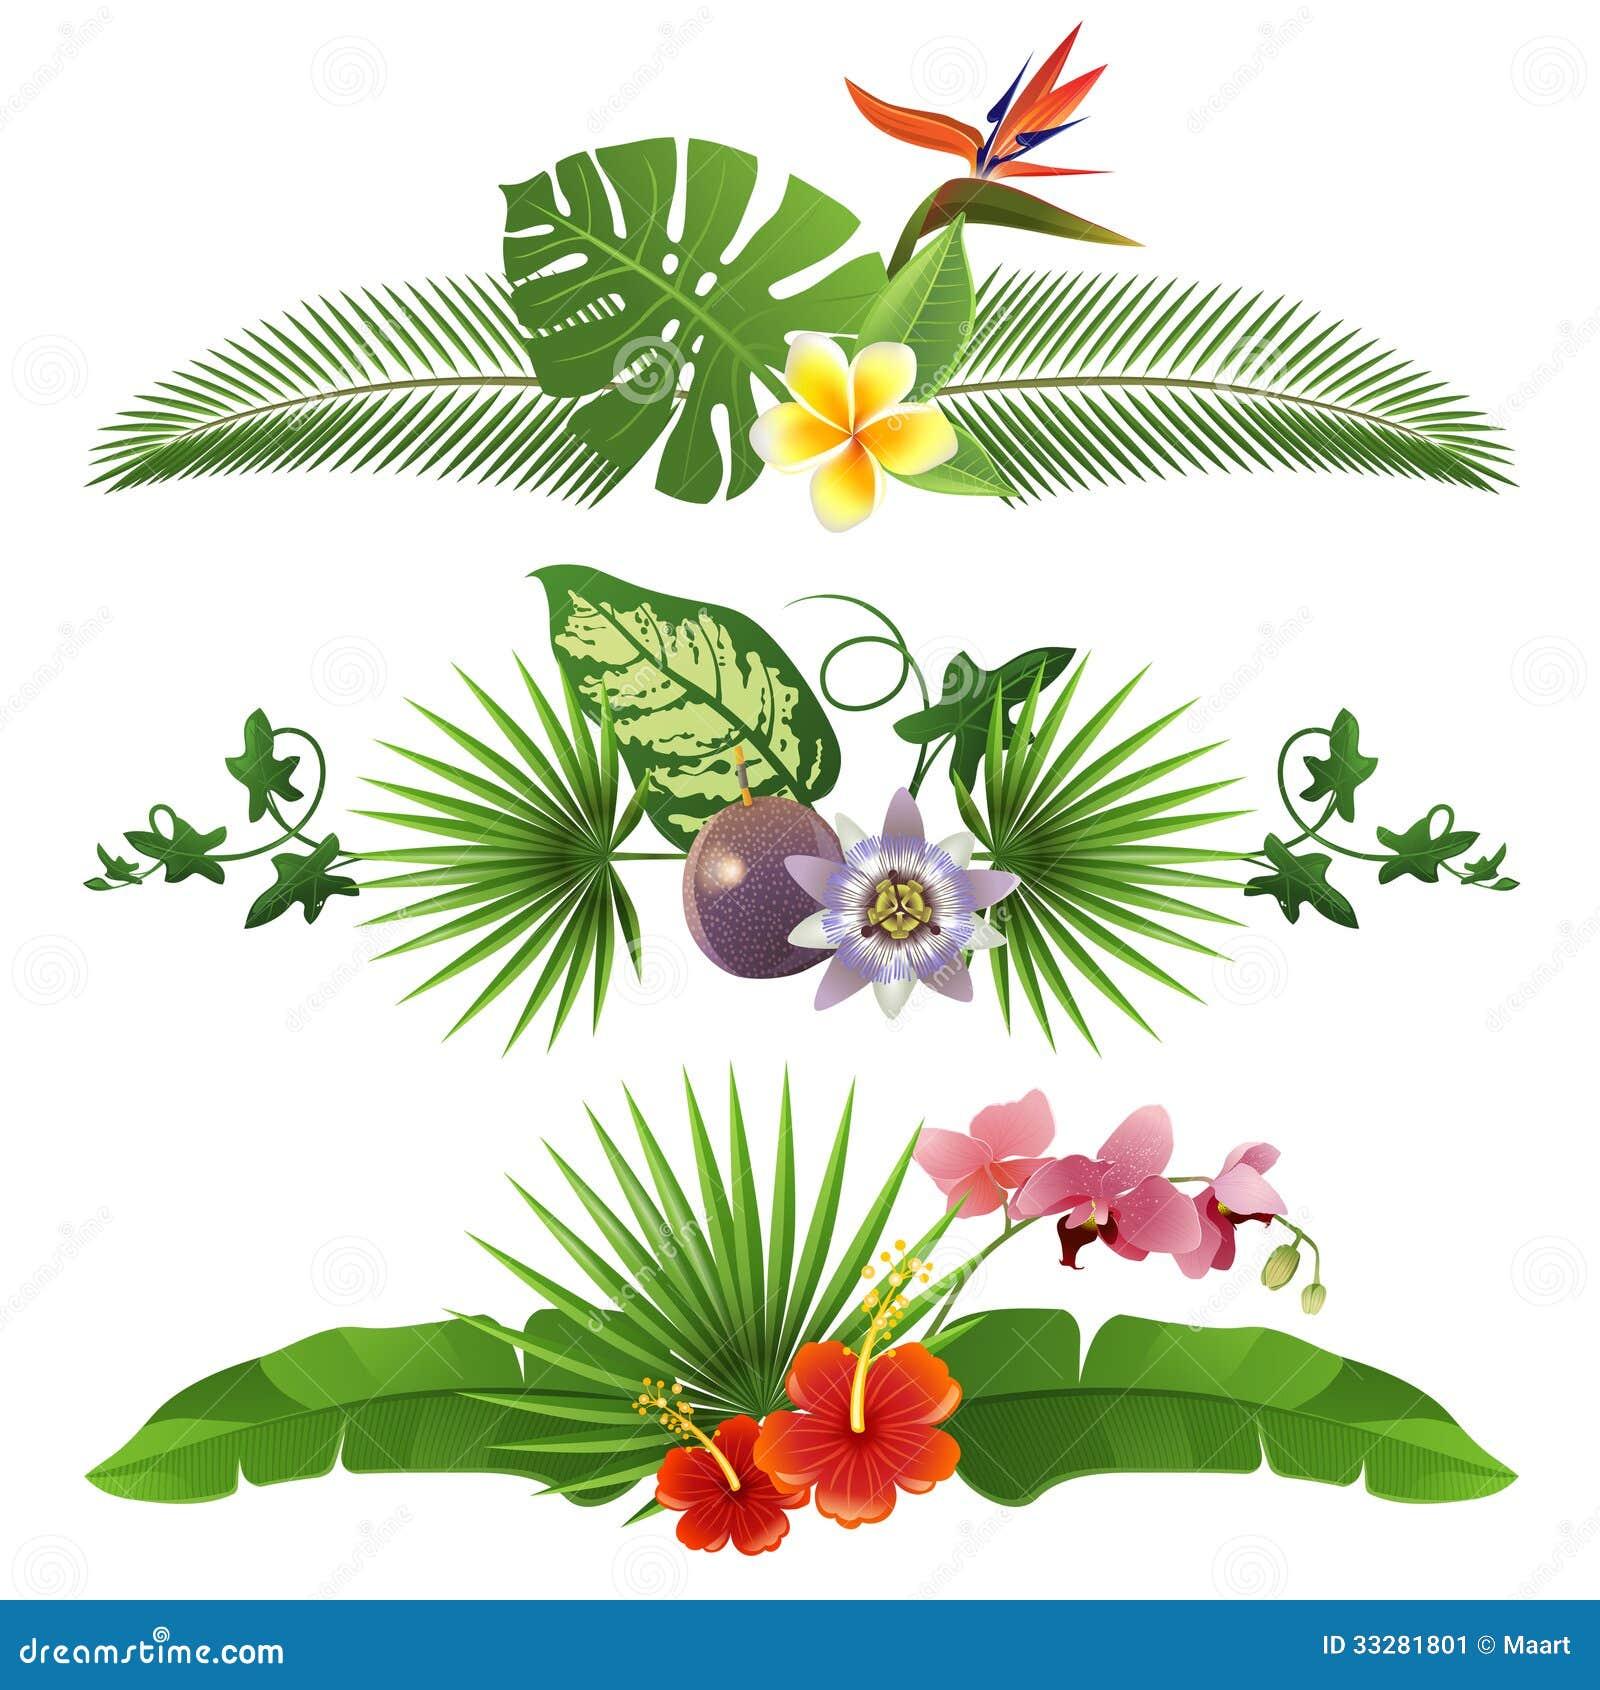 Tropical Borders Stock Image - Image: 33281801